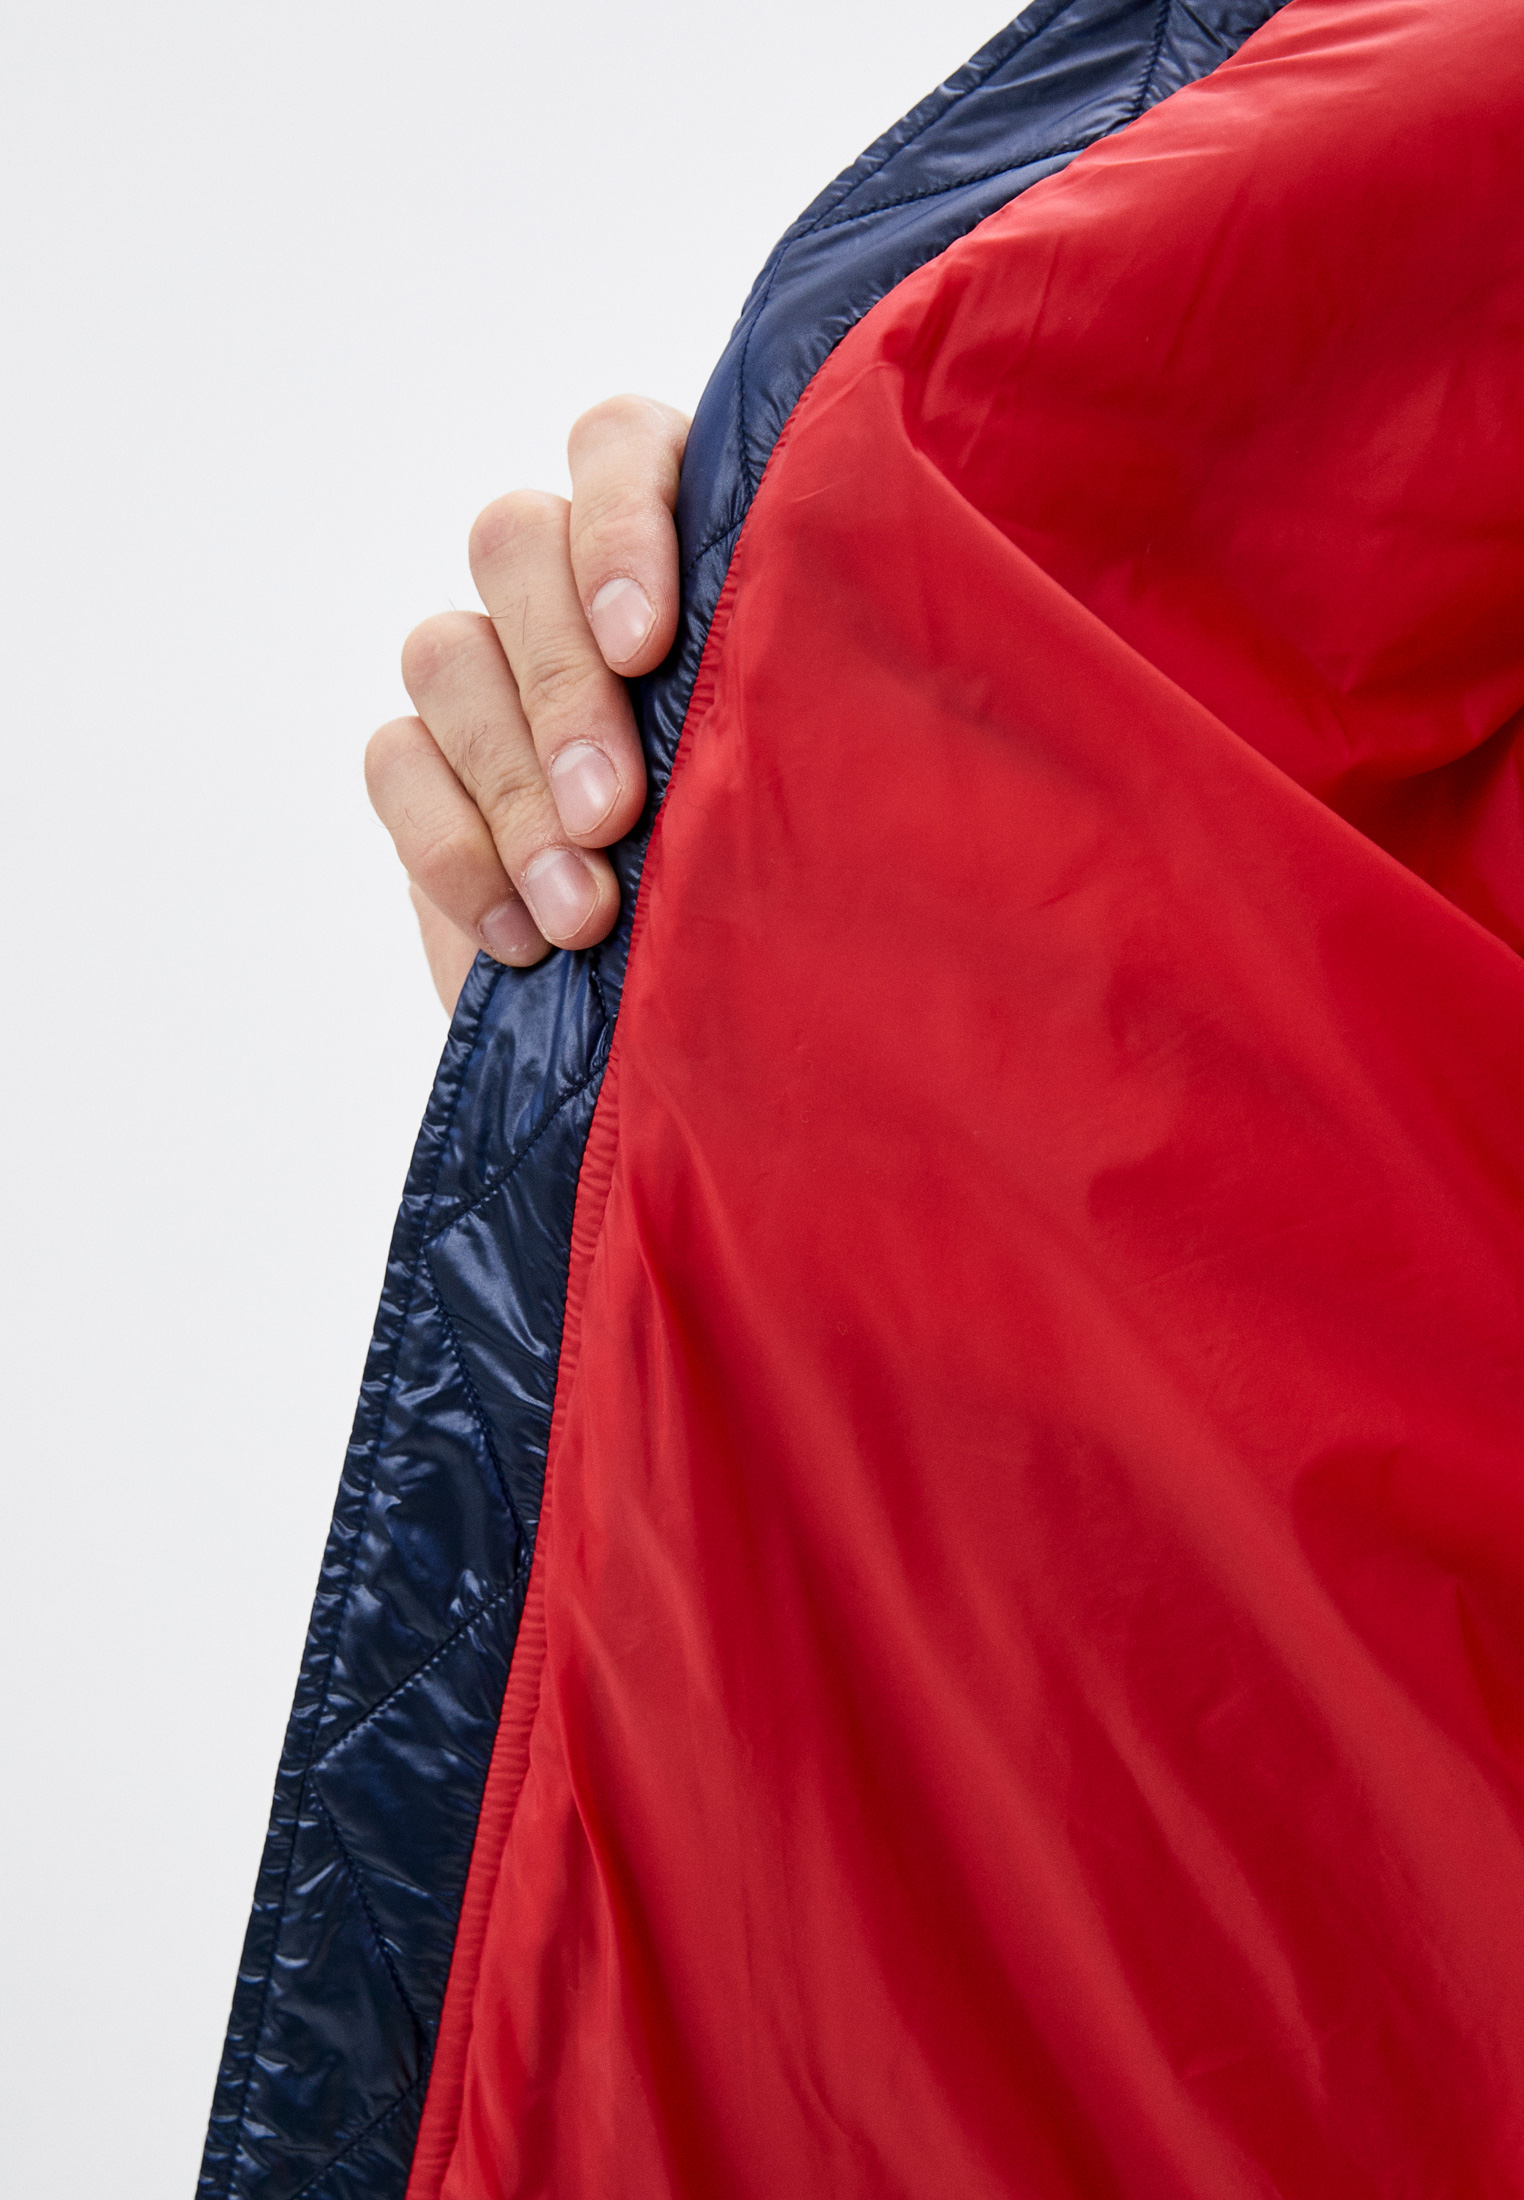 Мужская куртка Bikkembergs (Биккембергс) C H 090 00 T 9846: изображение 11